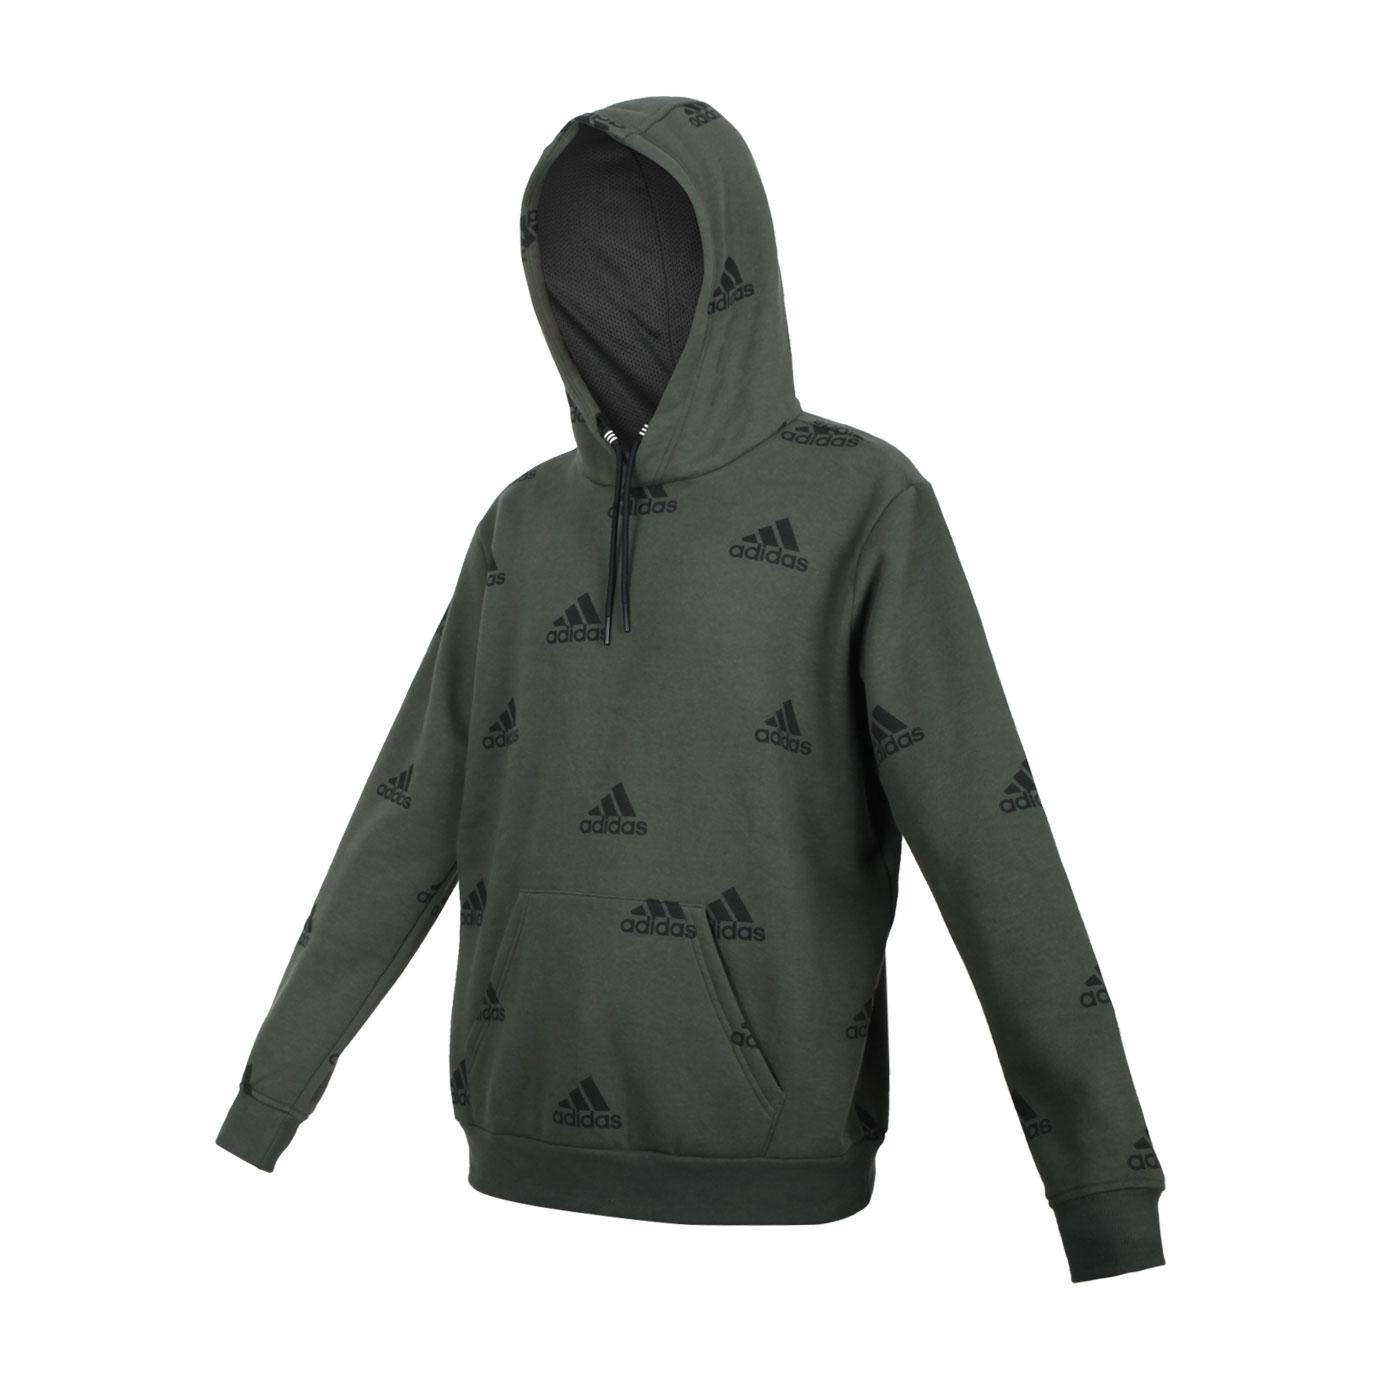 ADIDAS 男款連帽T恤 GQ5581 - 深綠黑